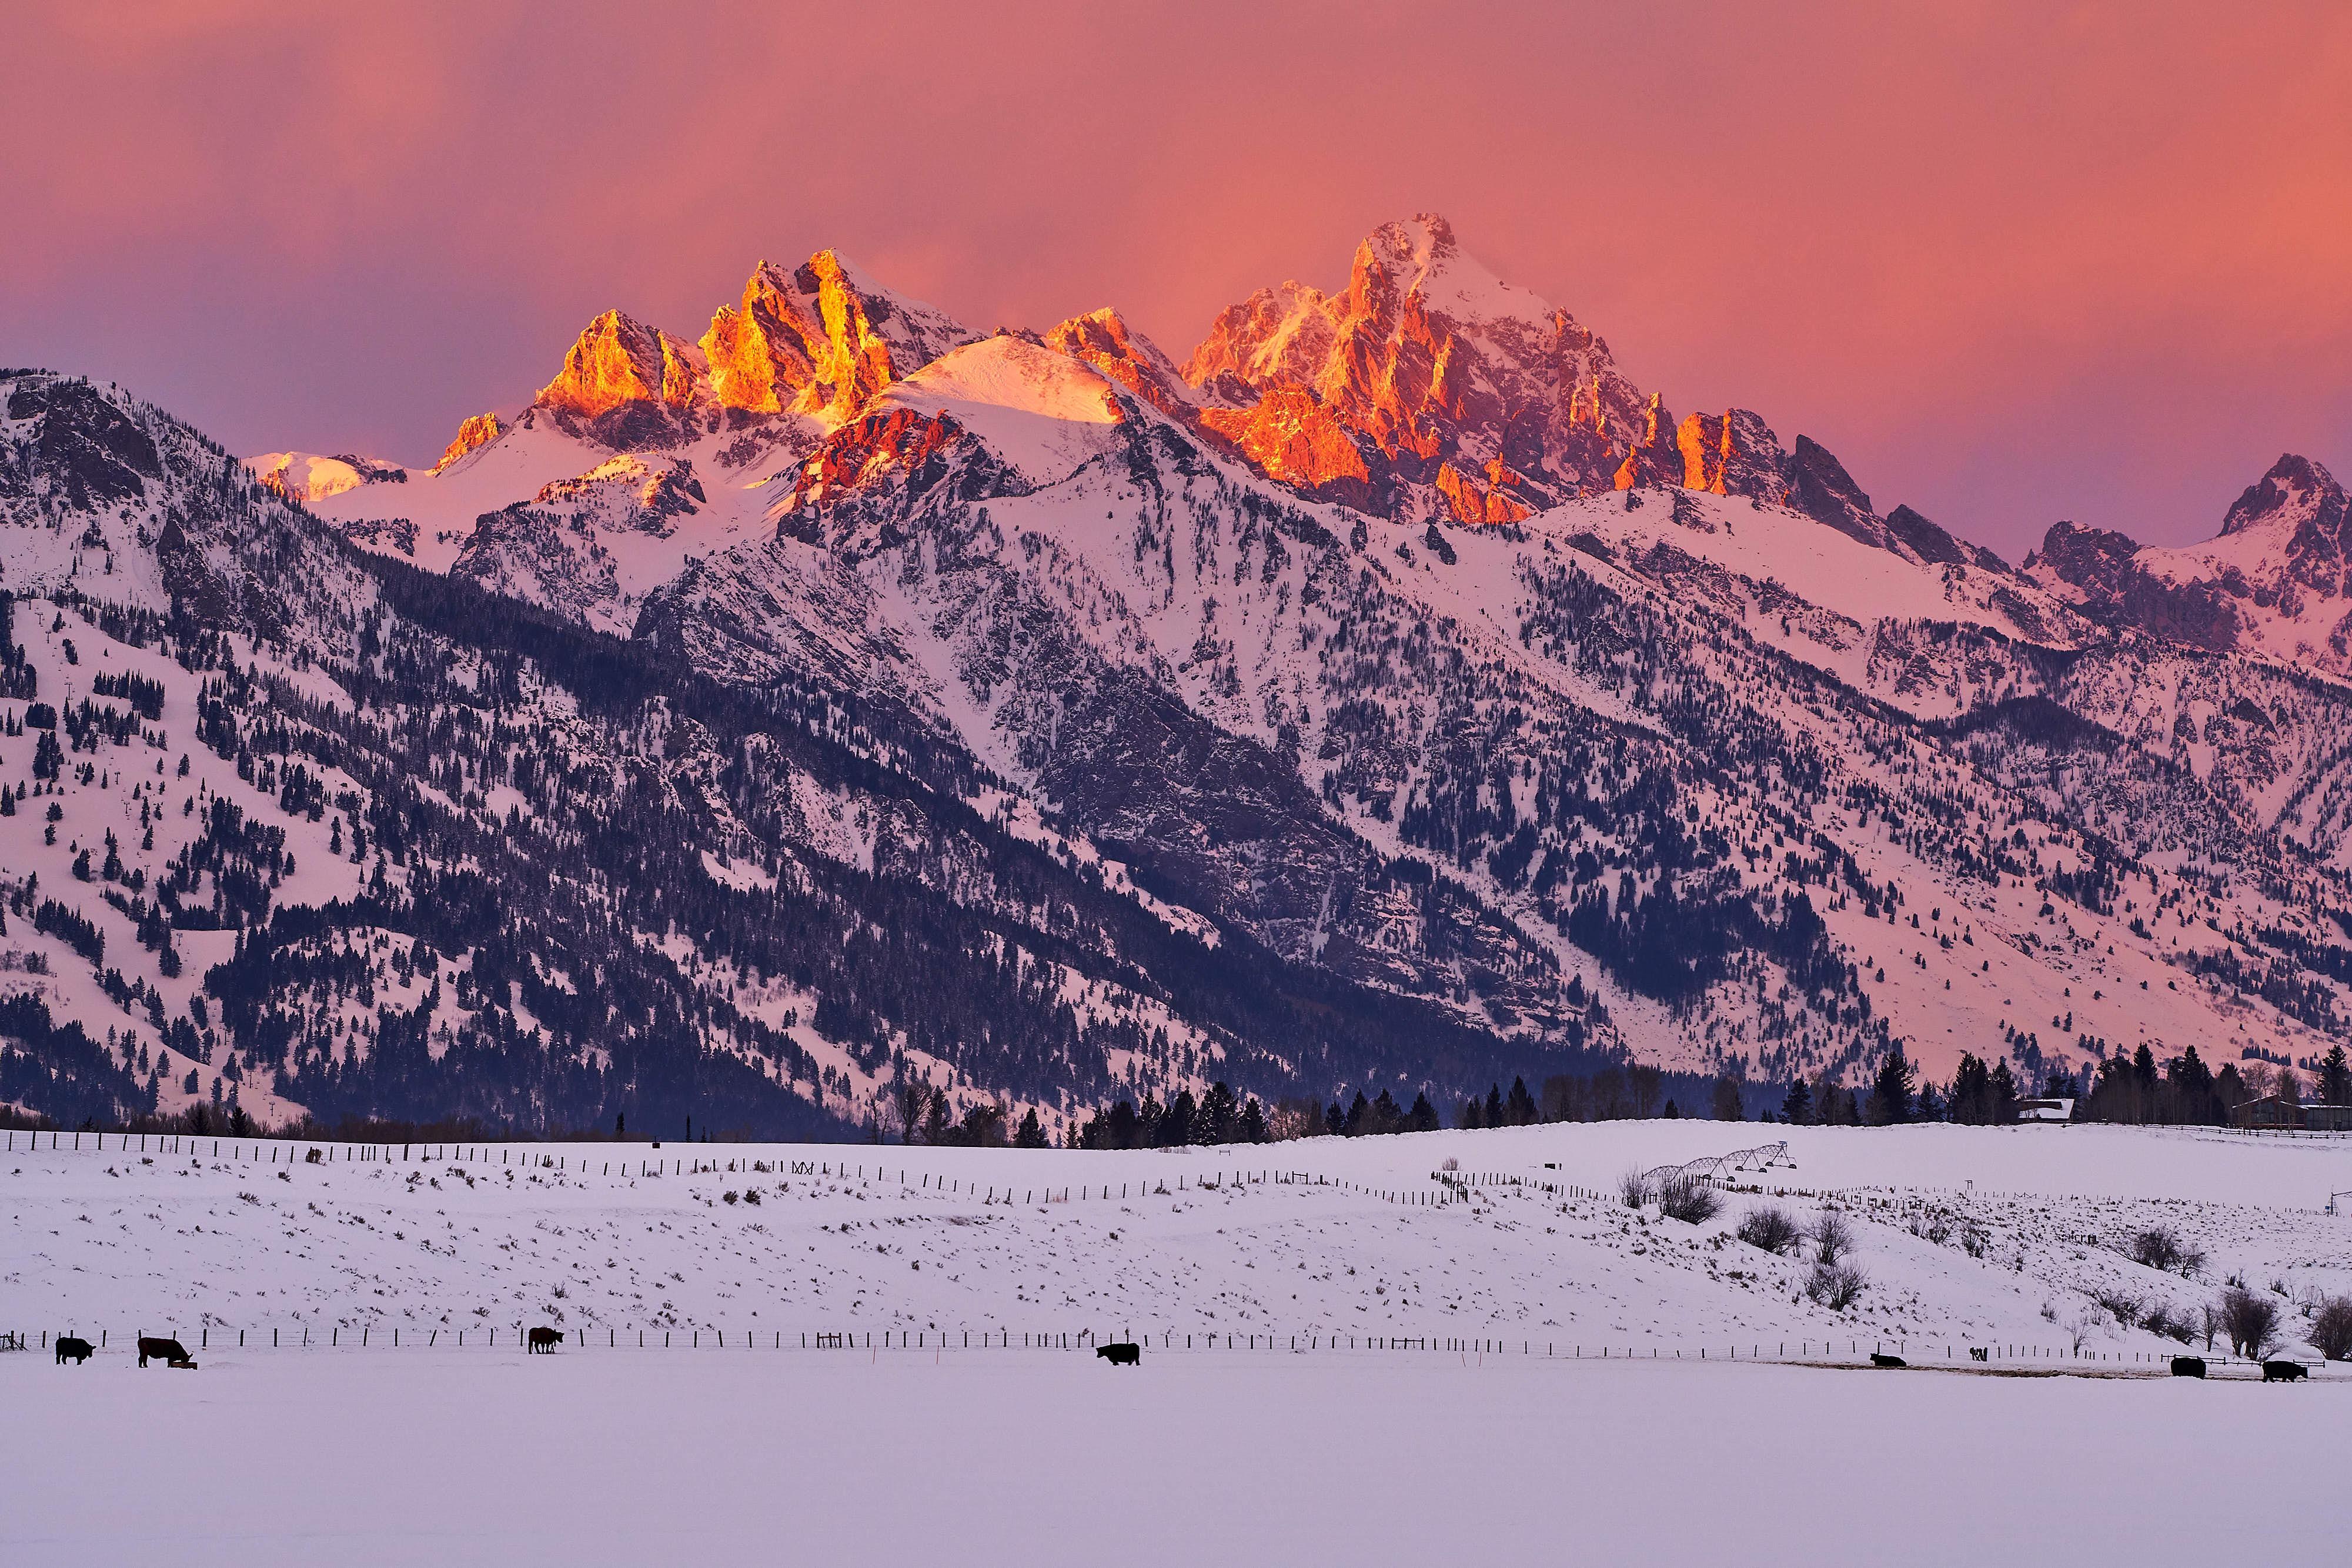 lightroom export tips - sunset over Grand Teton in Winter by Jay Goodrich